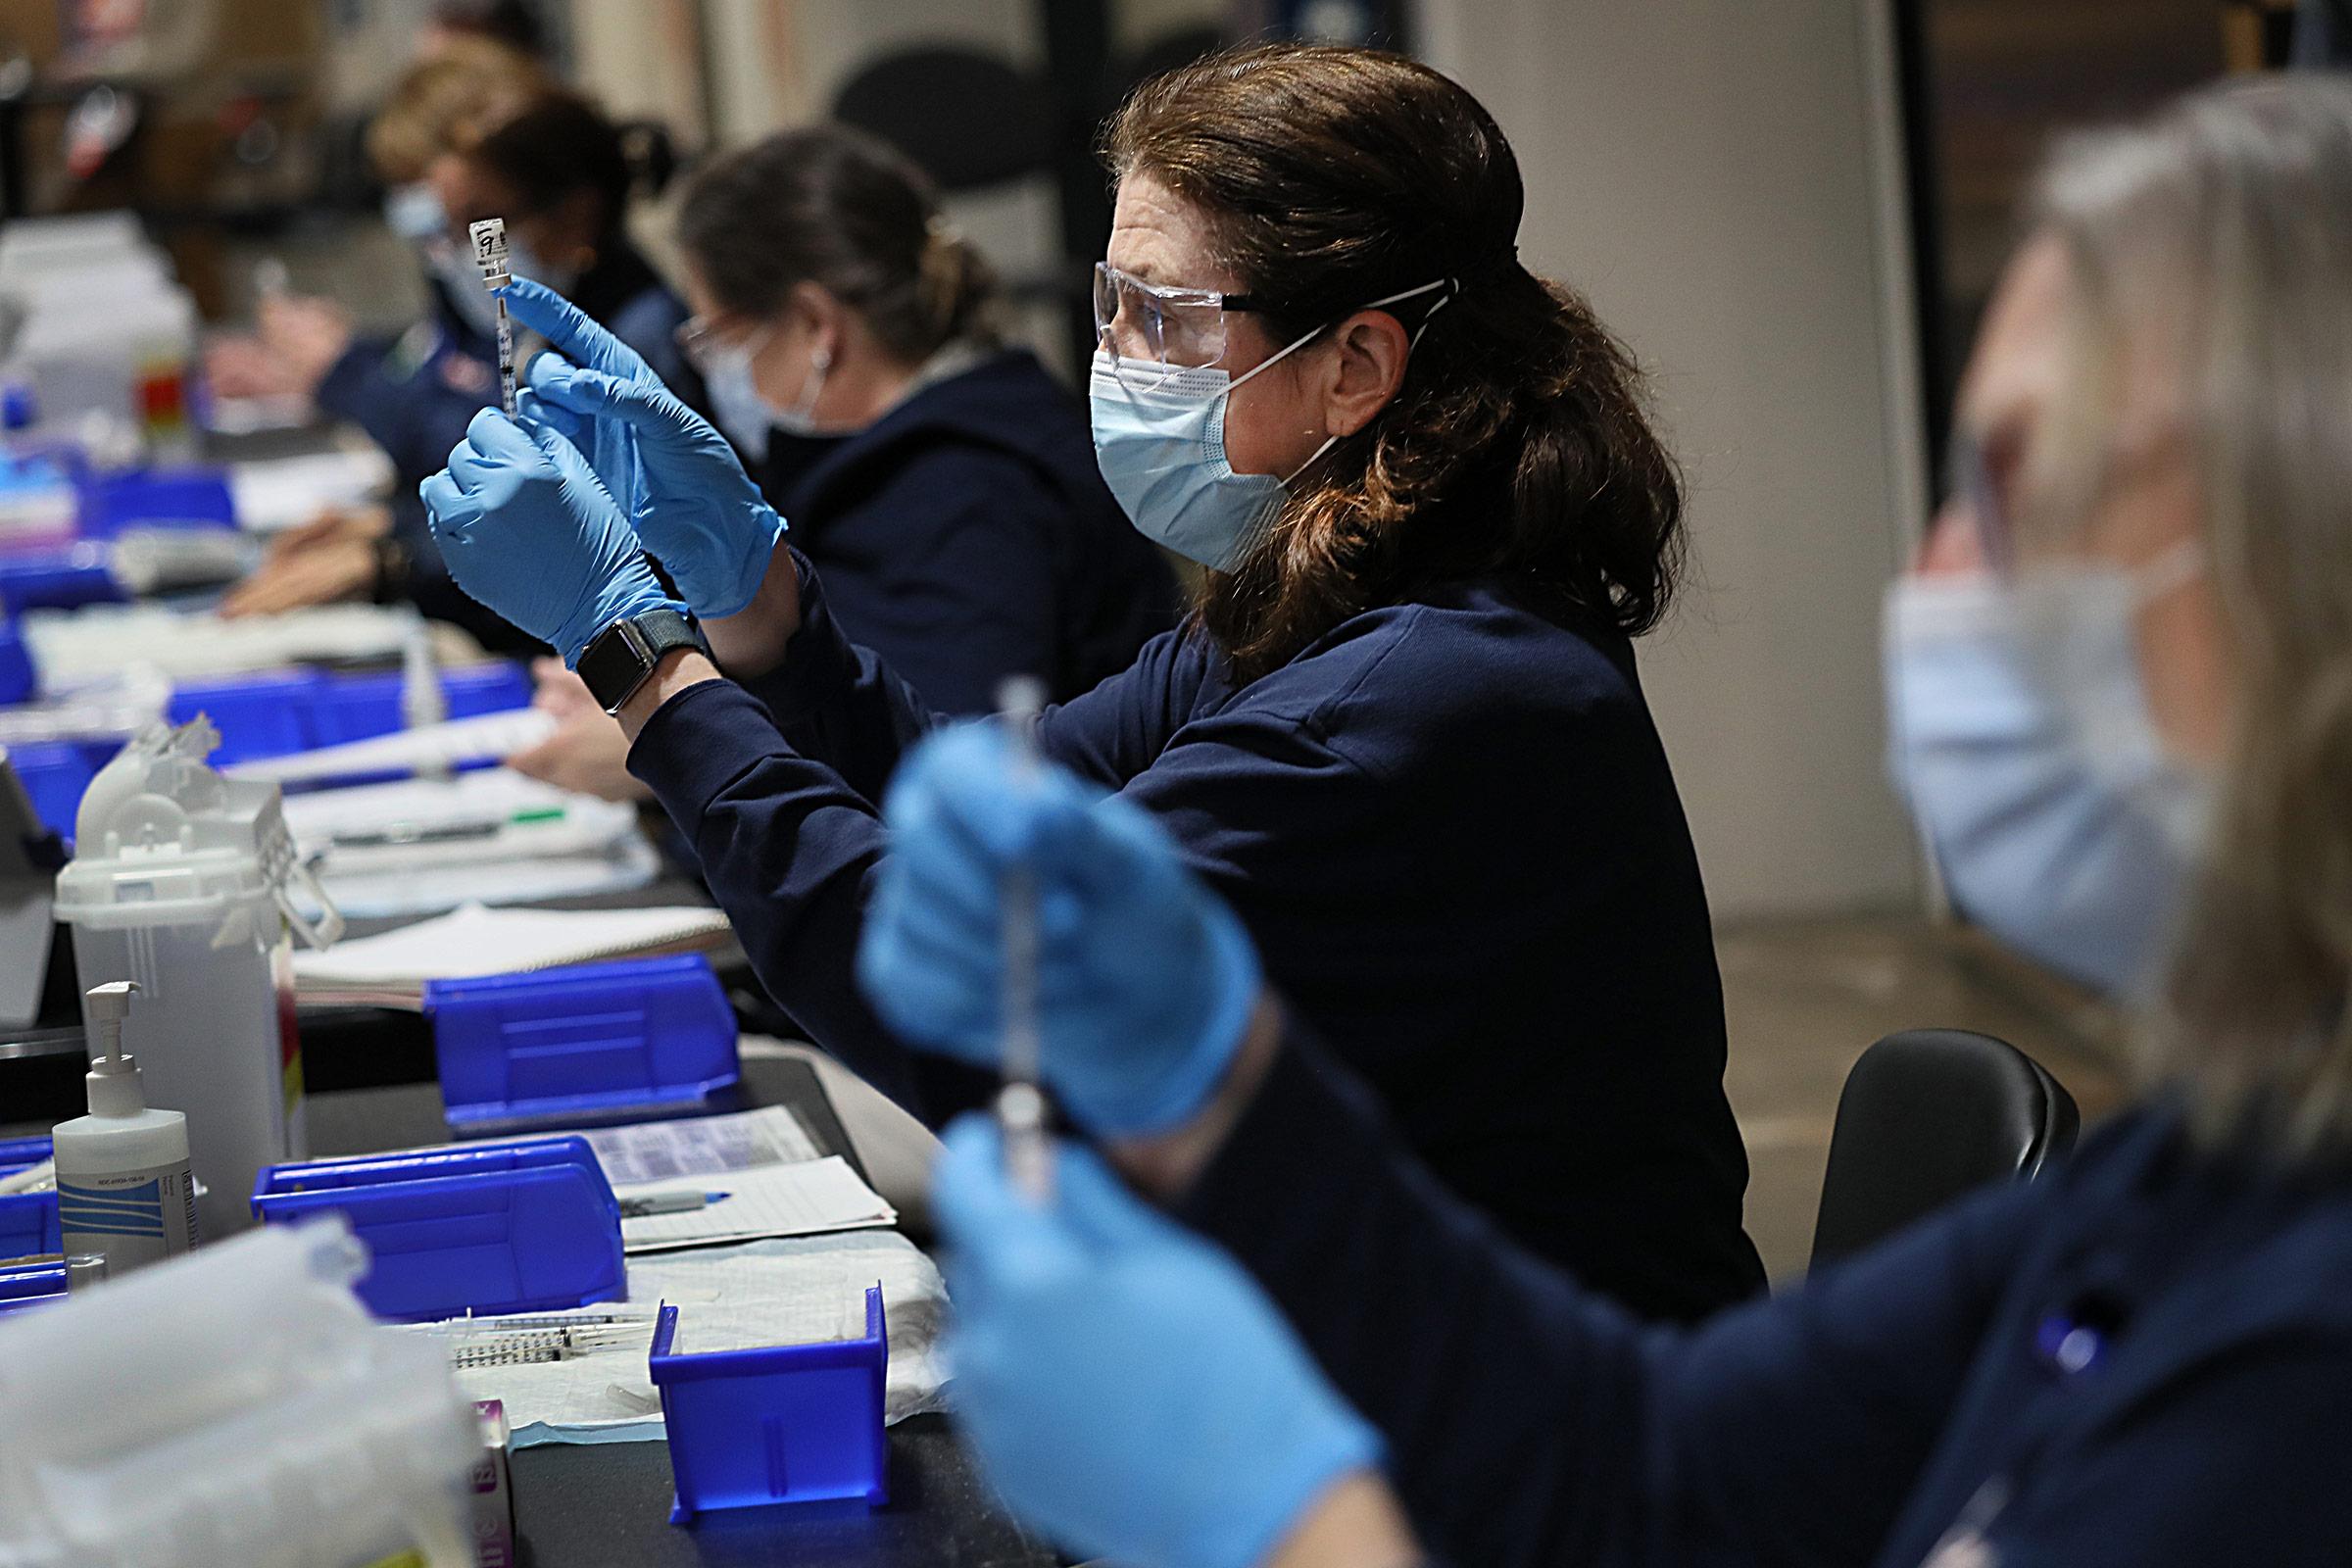 Covid-19 vaccine doses are prepared at the Hynes Convention Center in Boston, Massachusetts, on March 19.